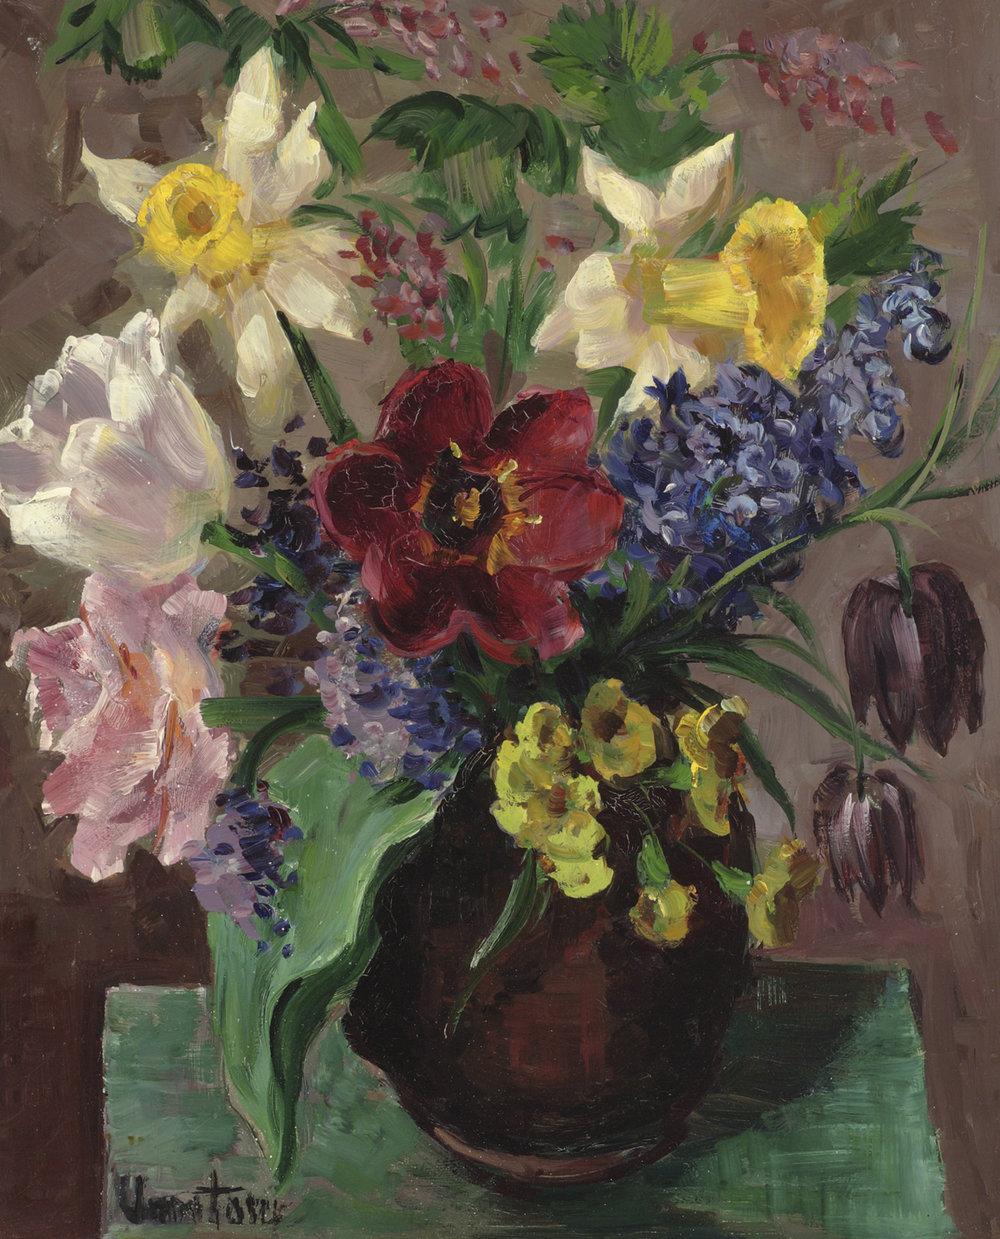 Mogens Vantore (Danish 1895-1977) 'Spring Flowers'